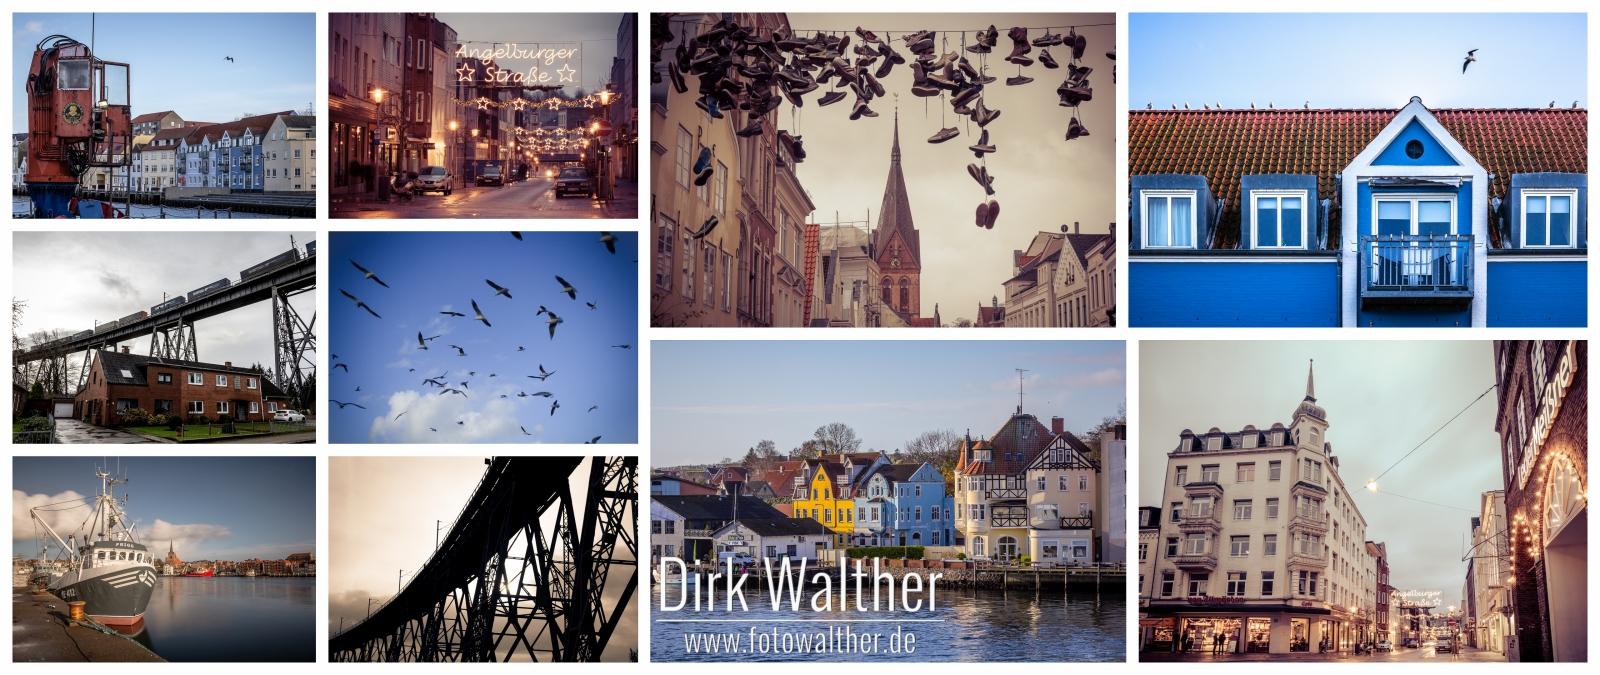 Collage: Sonderborg, Flensburg, Rendsburg